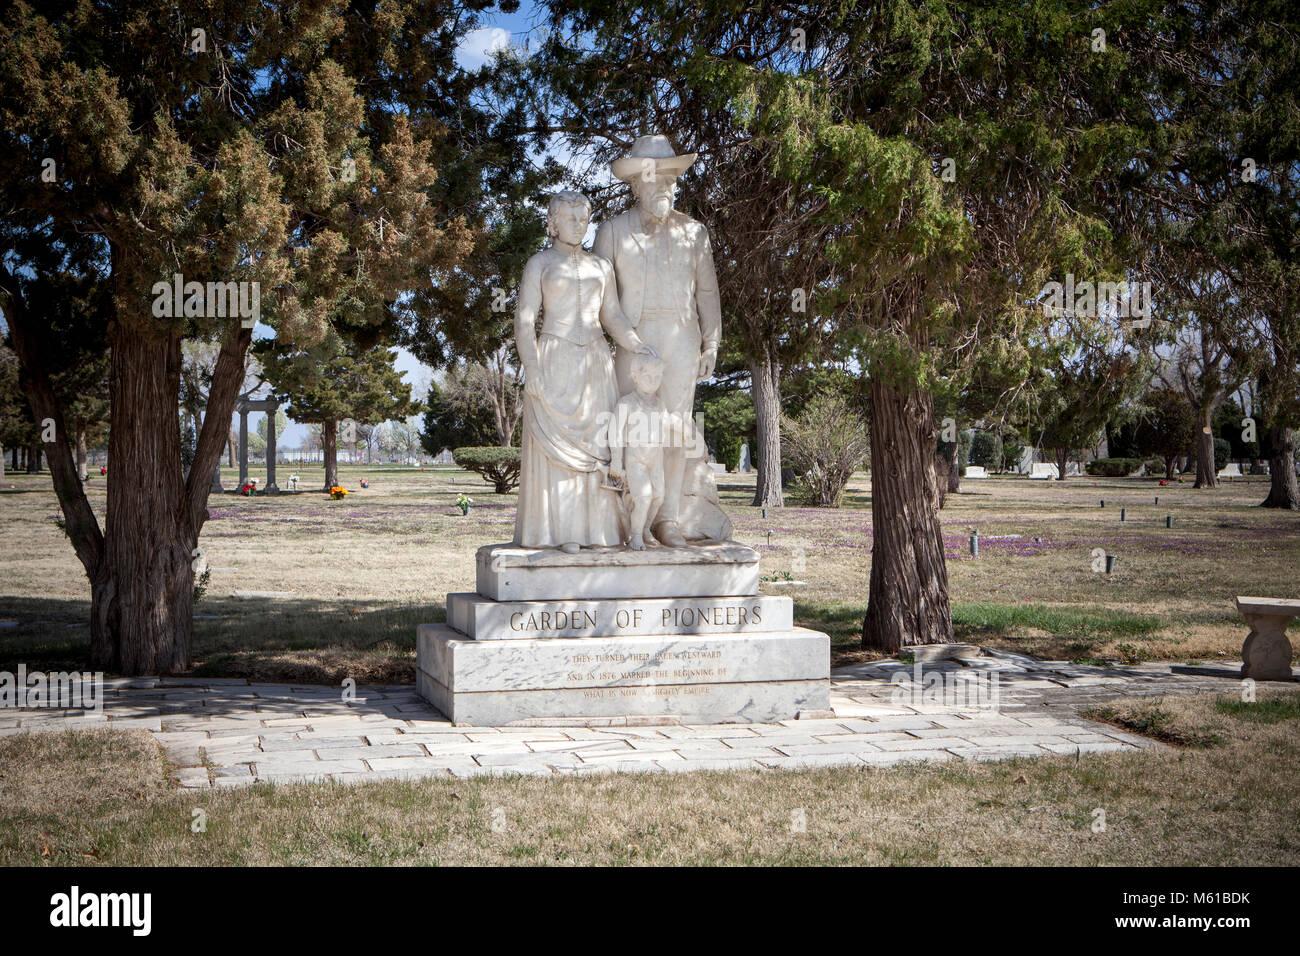 Garden of Pioneers, Llano cemetery, Amarillo, Texas. - Stock Image